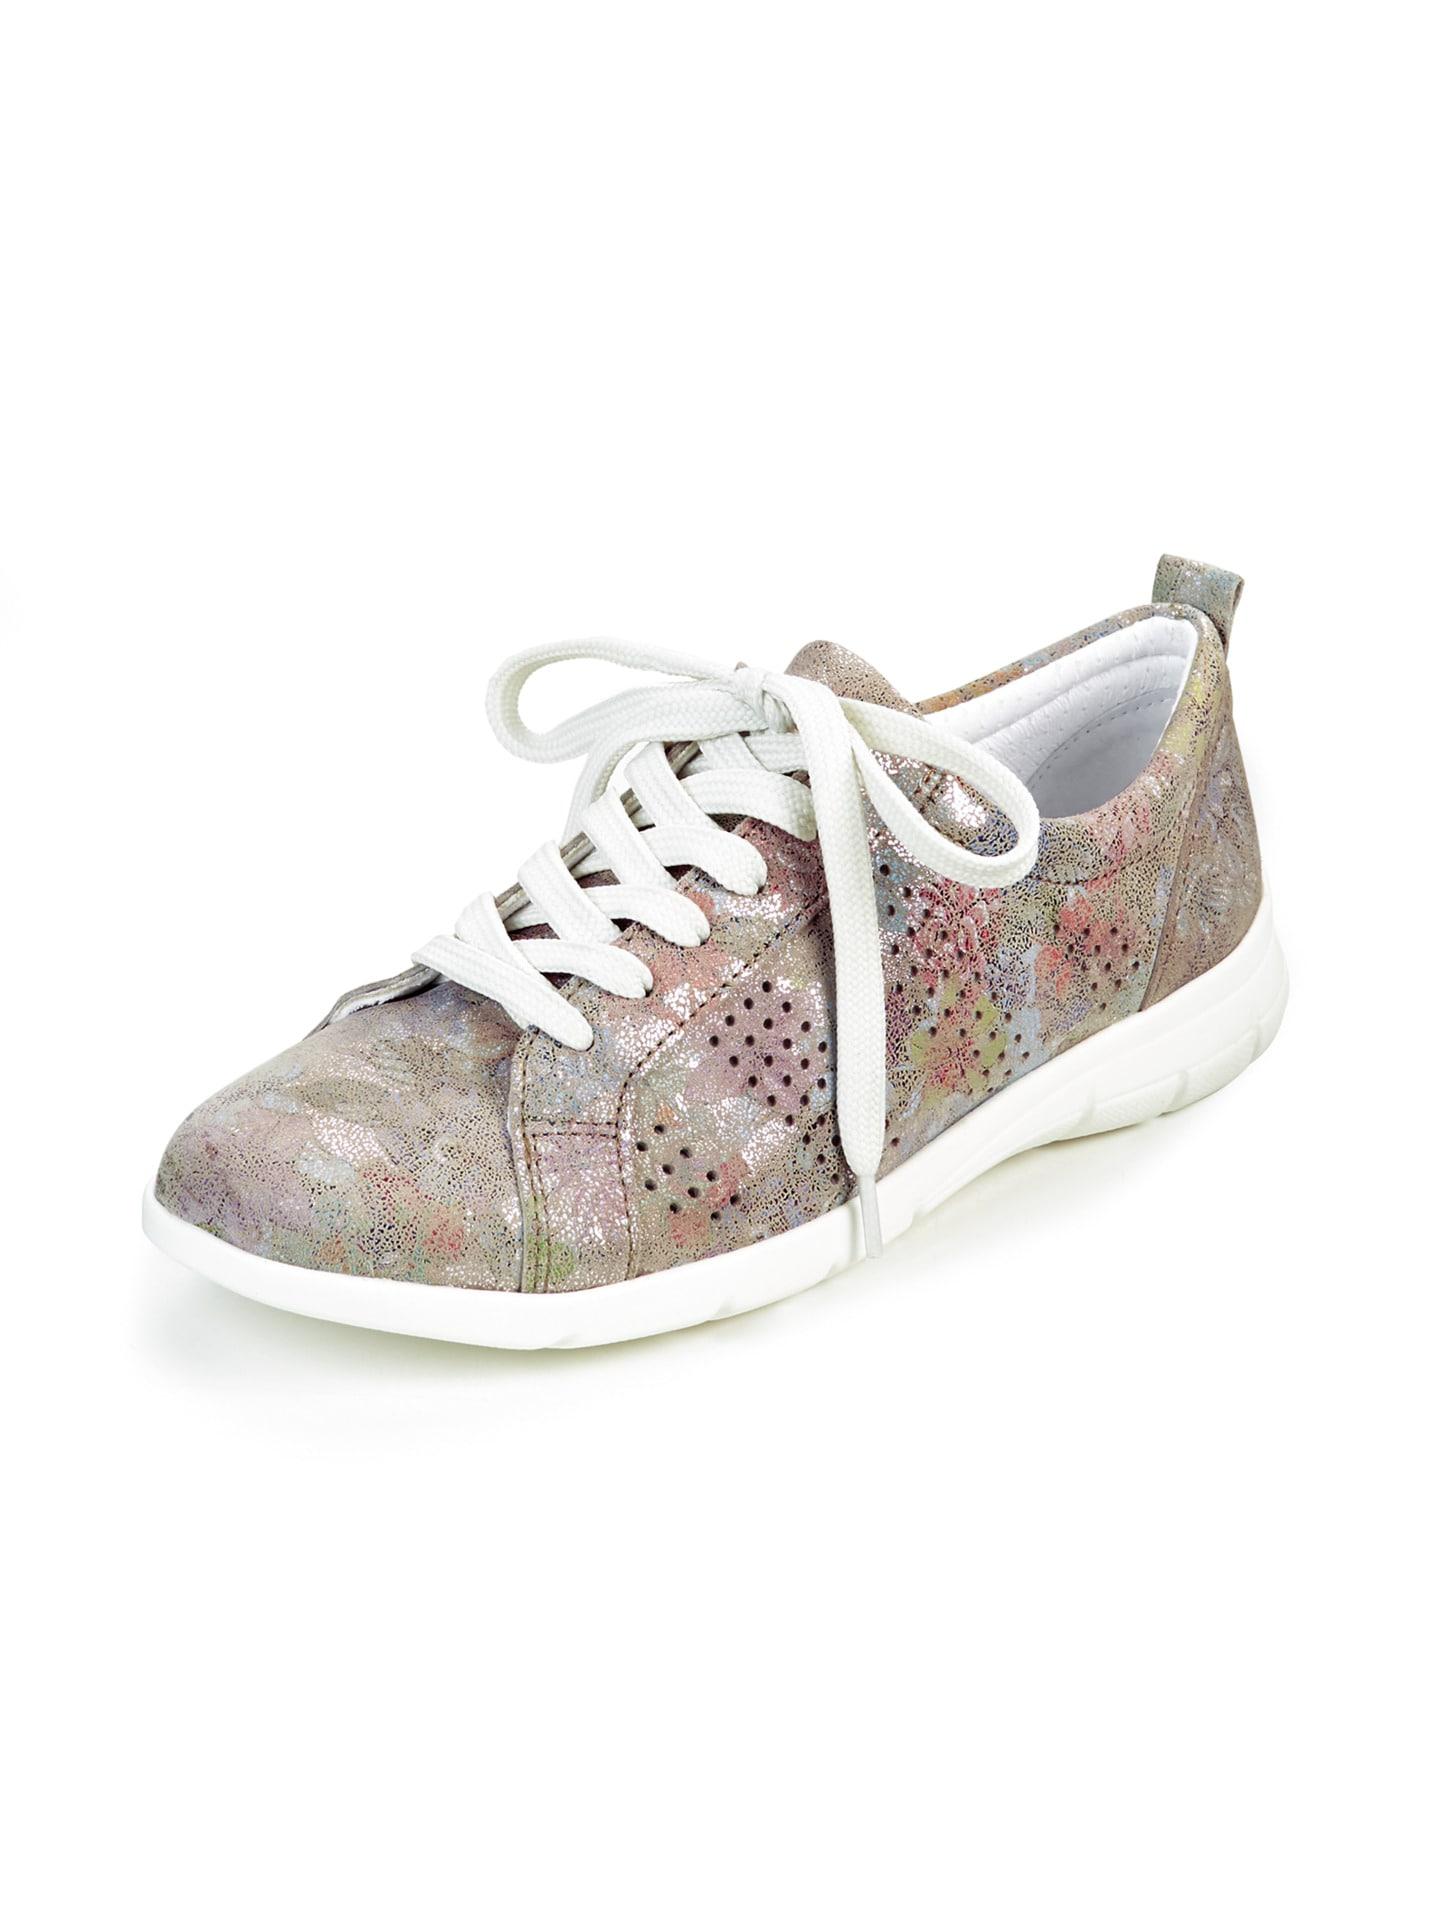 Avena Damen Leder-Leicht-Sneaker Rosé 45-7278-9